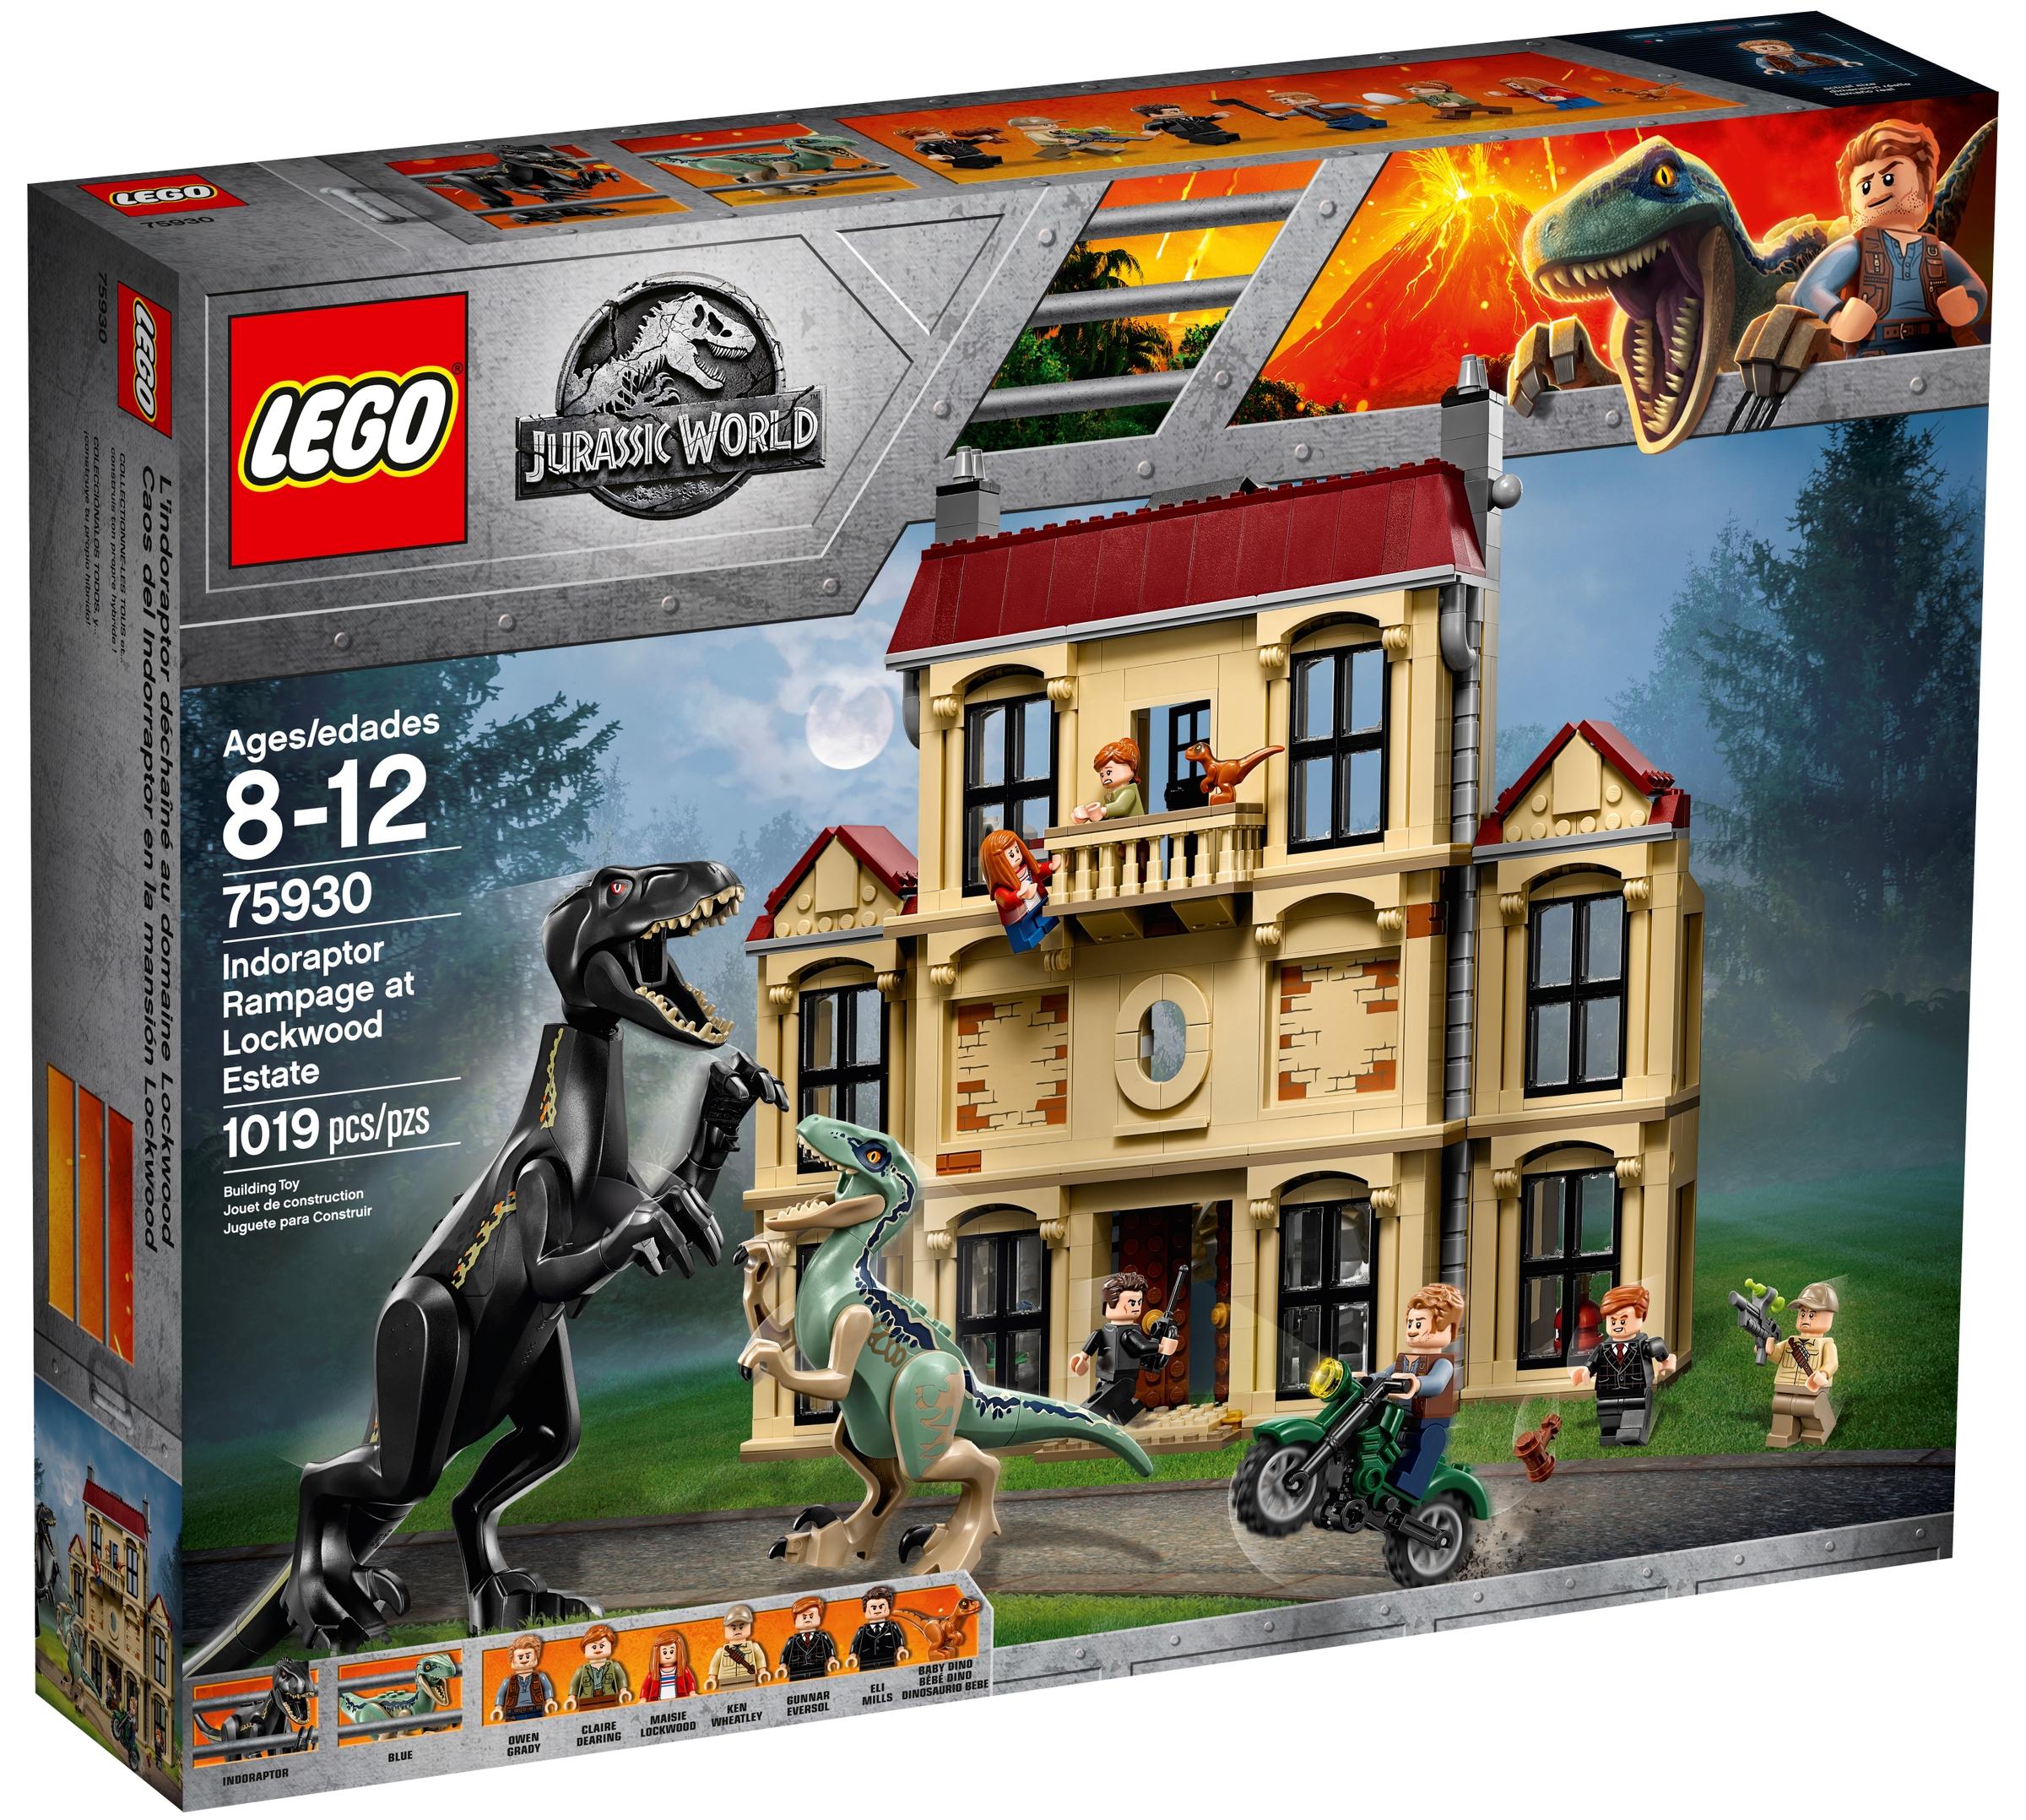 lego 75930 indoraptor stormer lockwoods gods